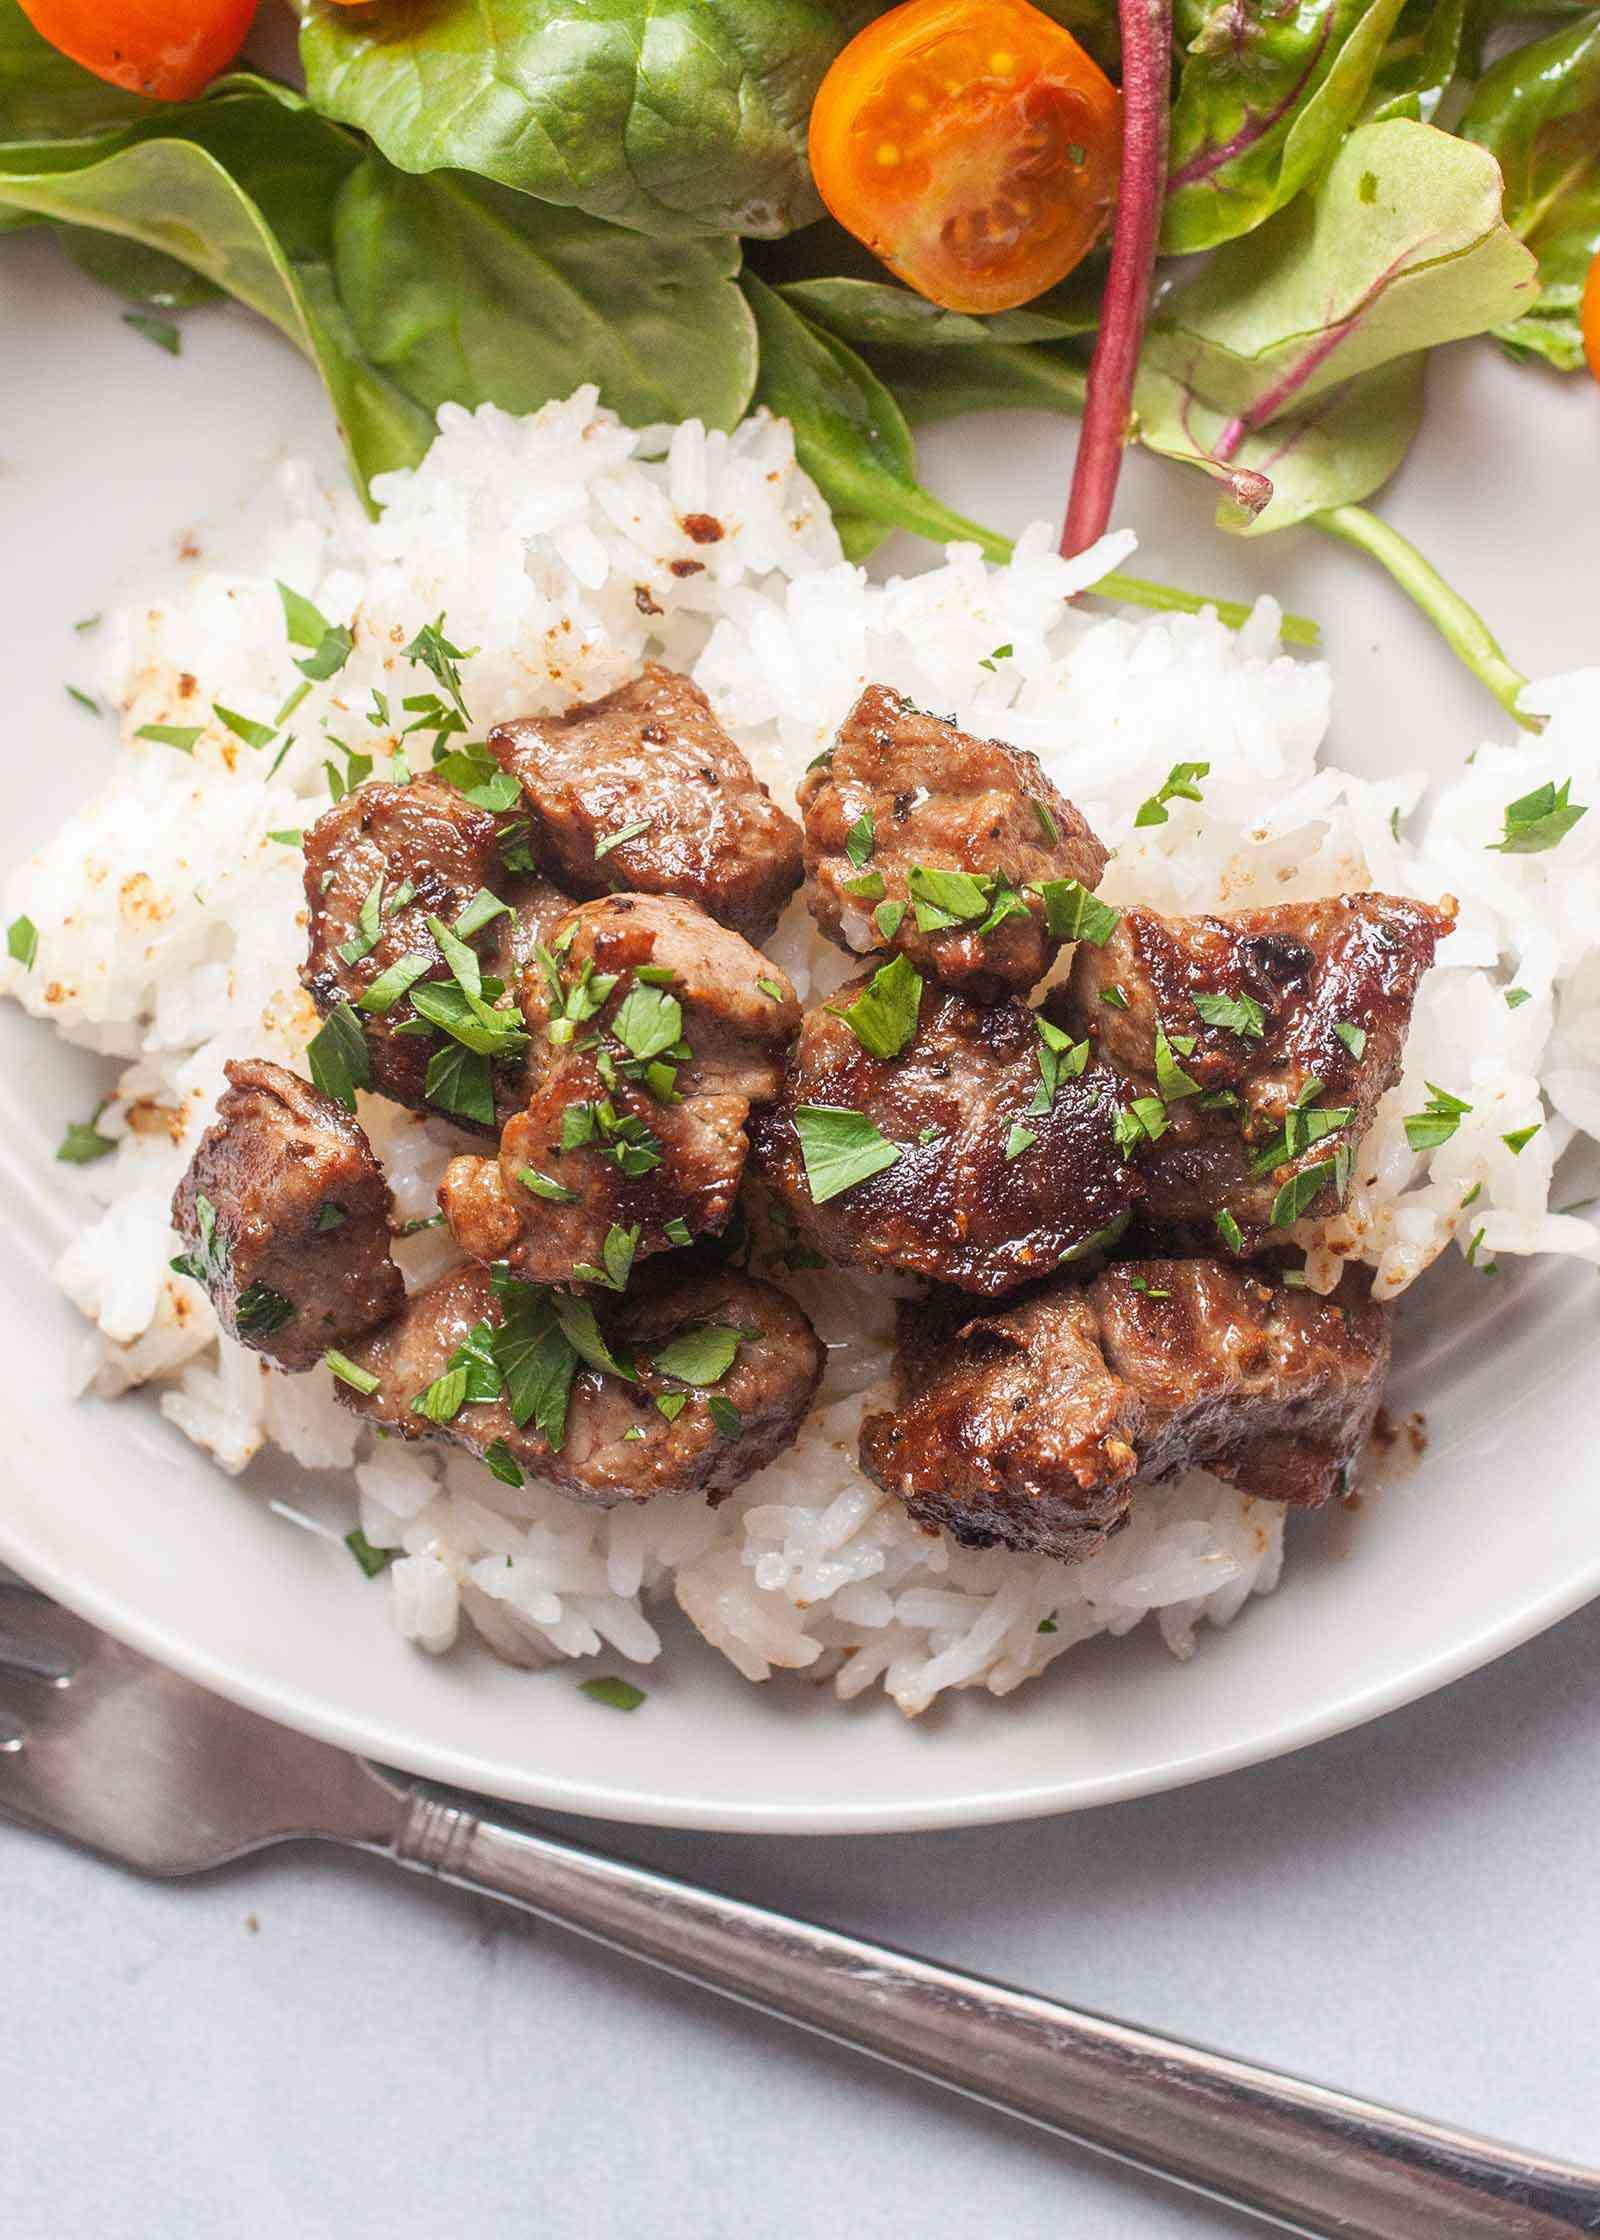 Beef Cube Recipe with Garlic